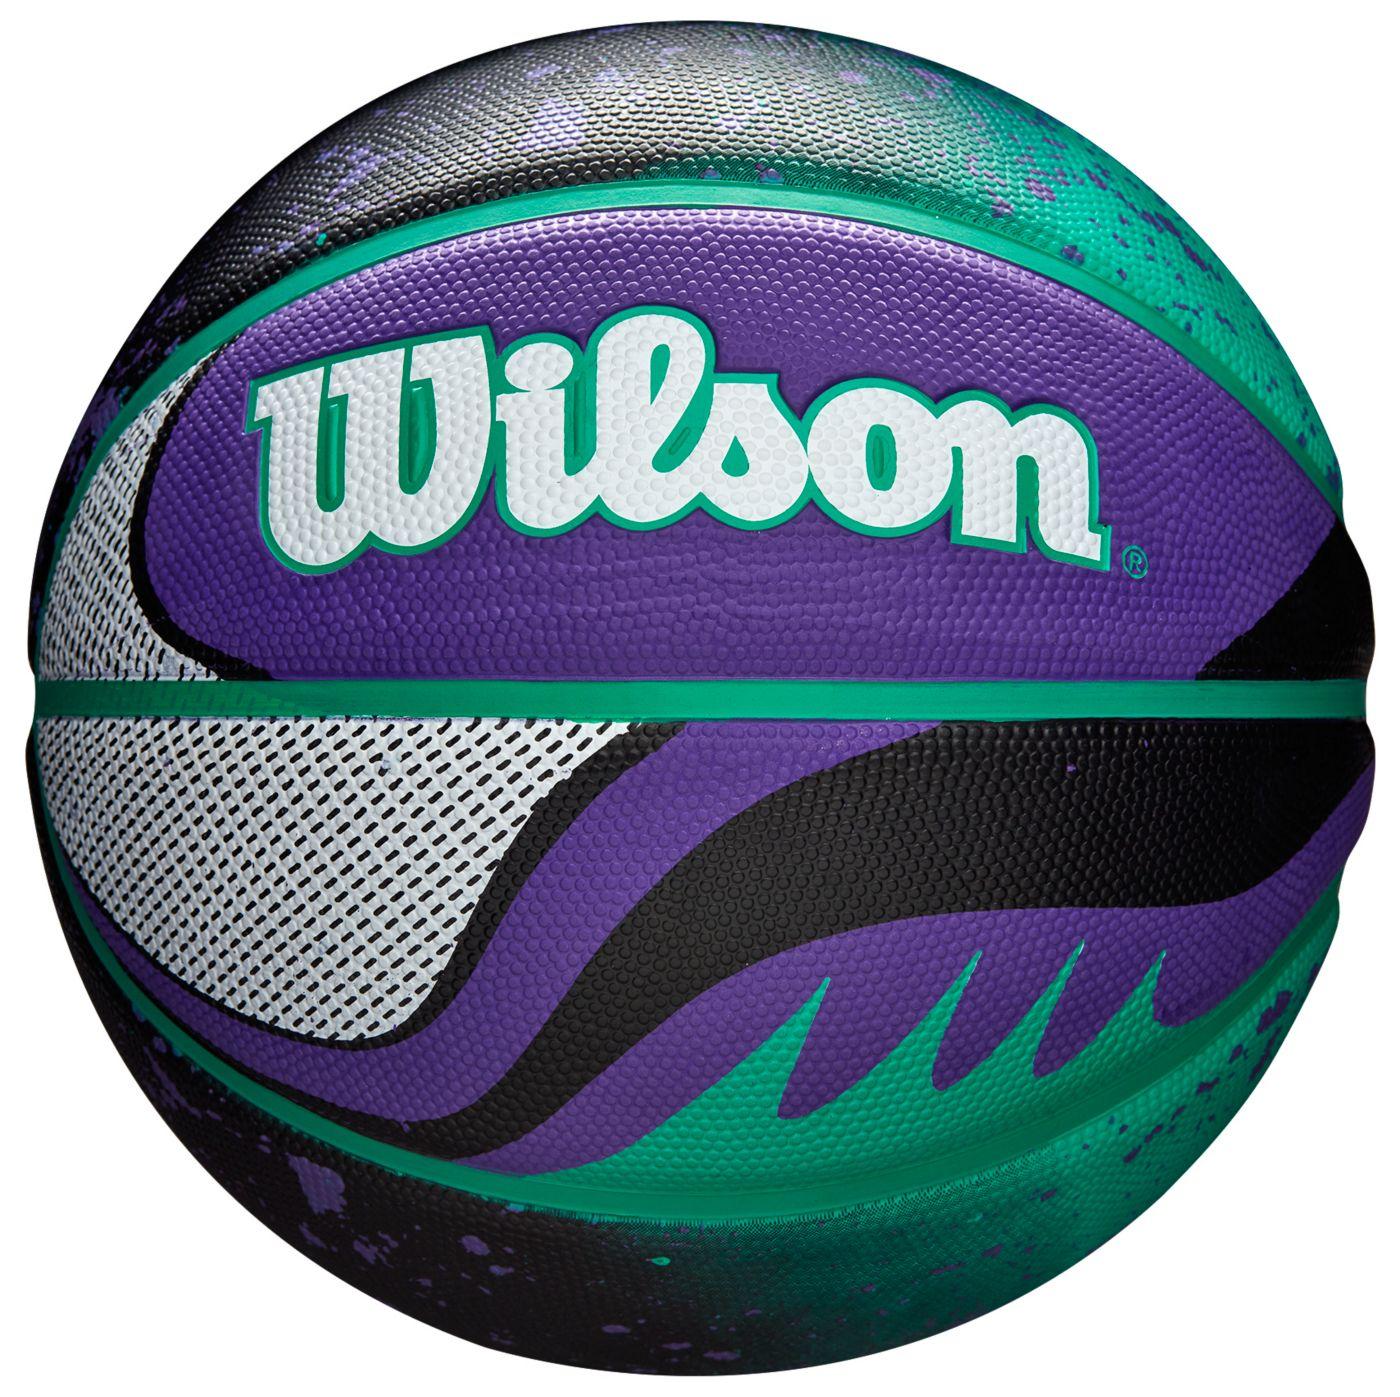 "Wilson 21 Series Youth Basketball (27.5"")"